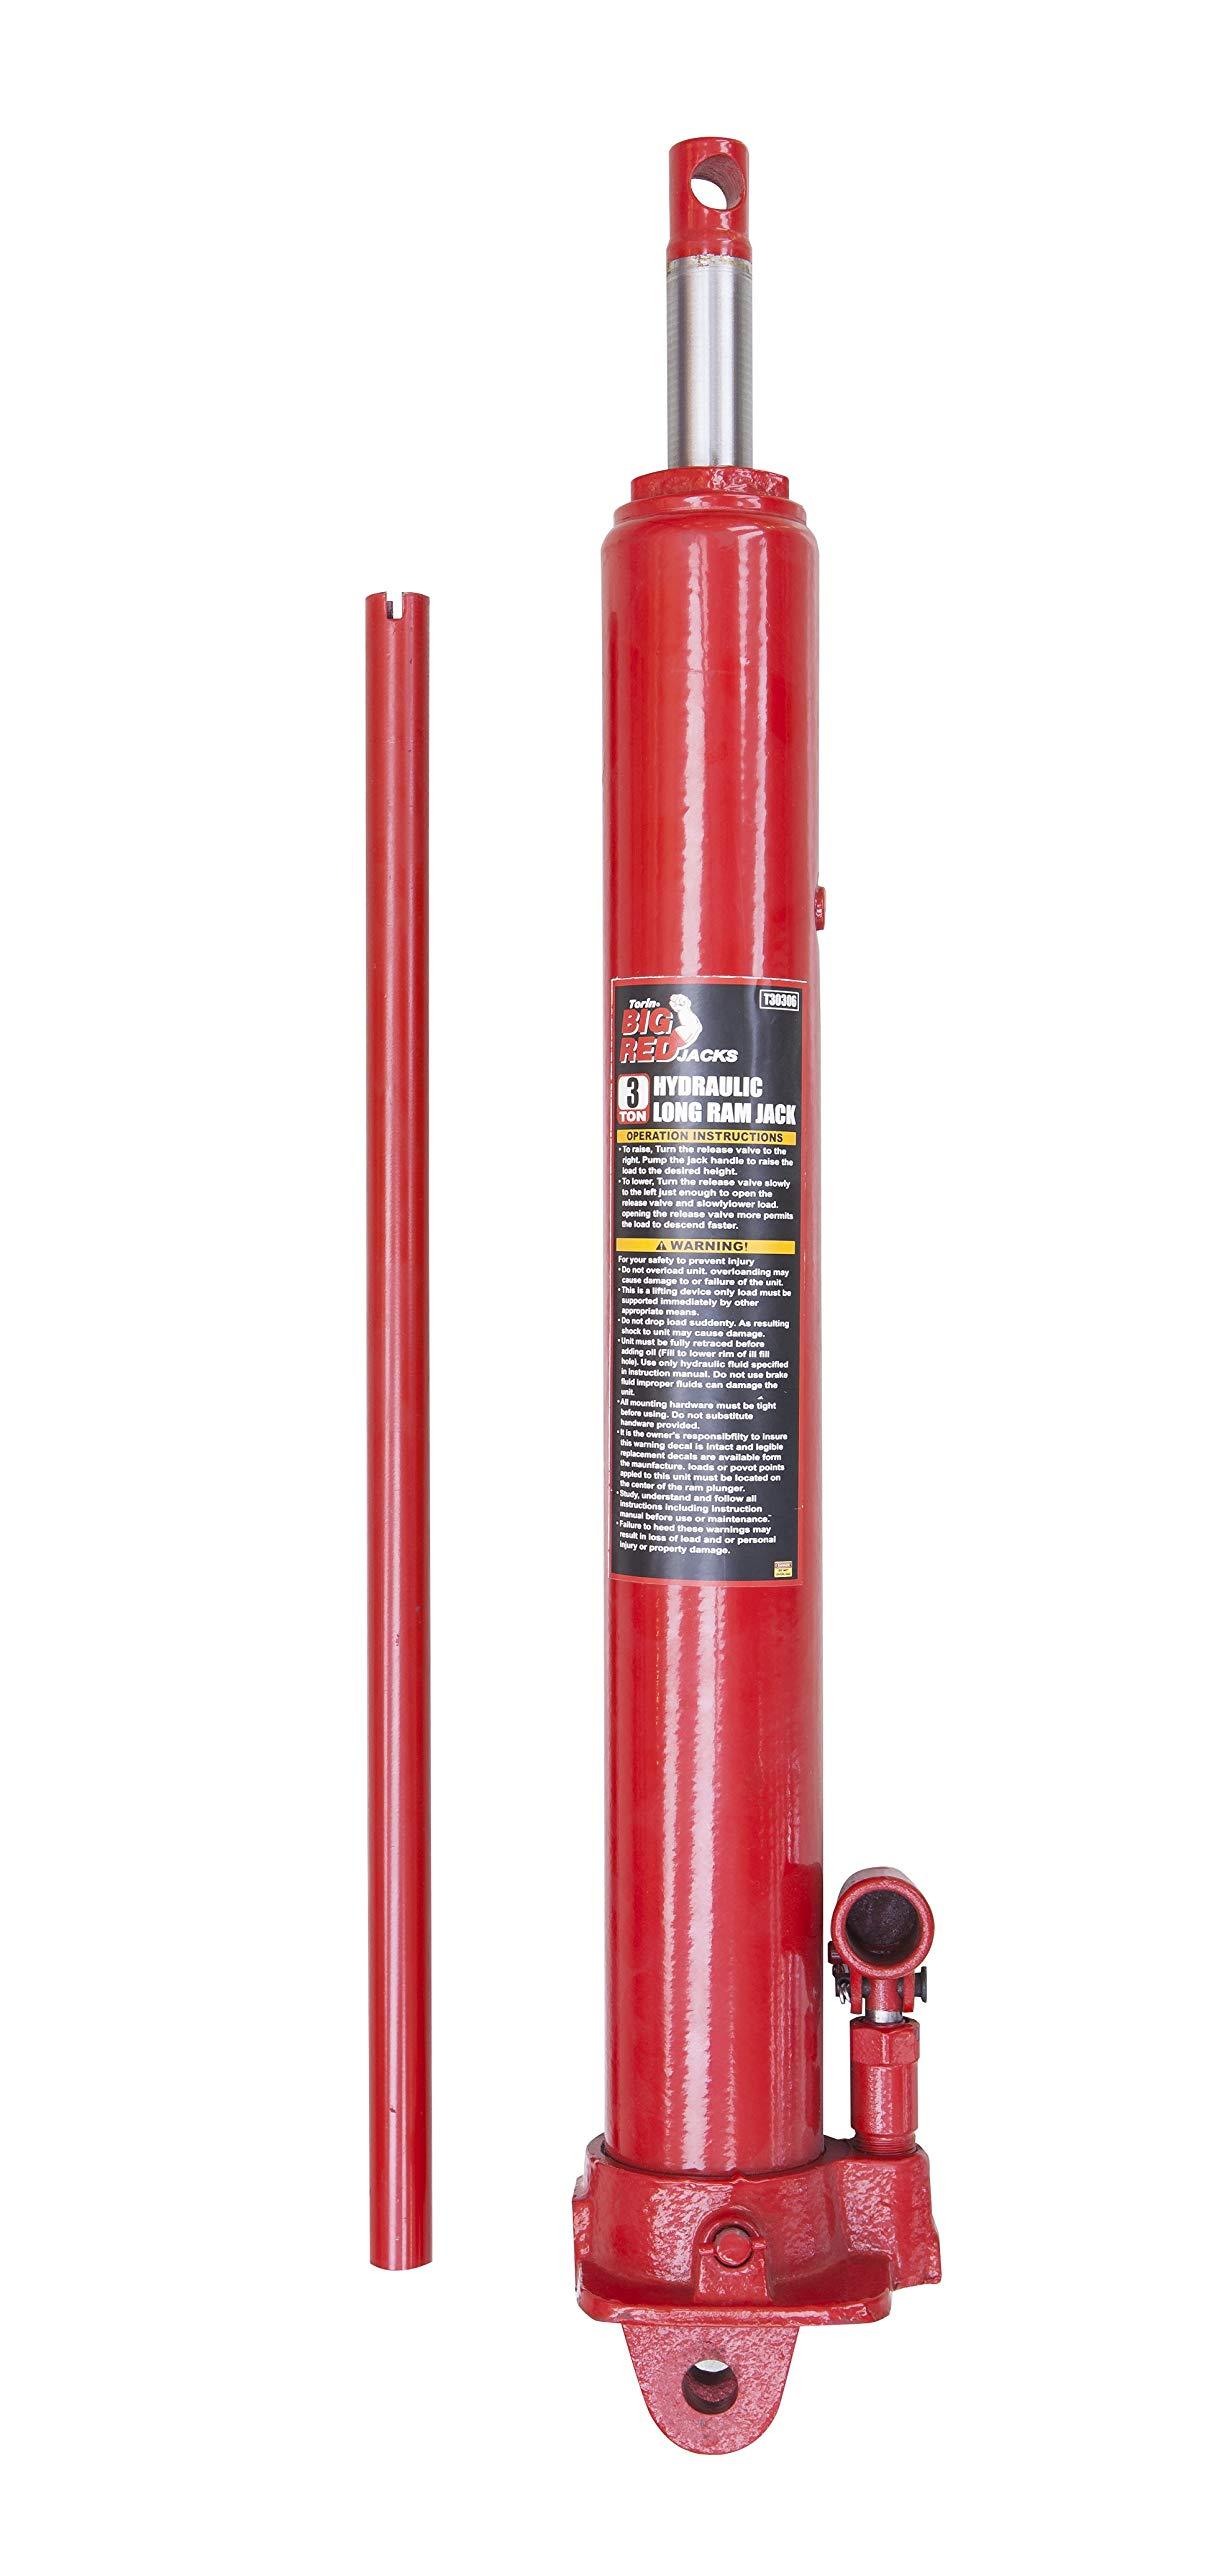 Torin Big Red Long Ram Hydraulic Jack: Single Piston, Clevis Base, 3 Ton Capacity by Torin